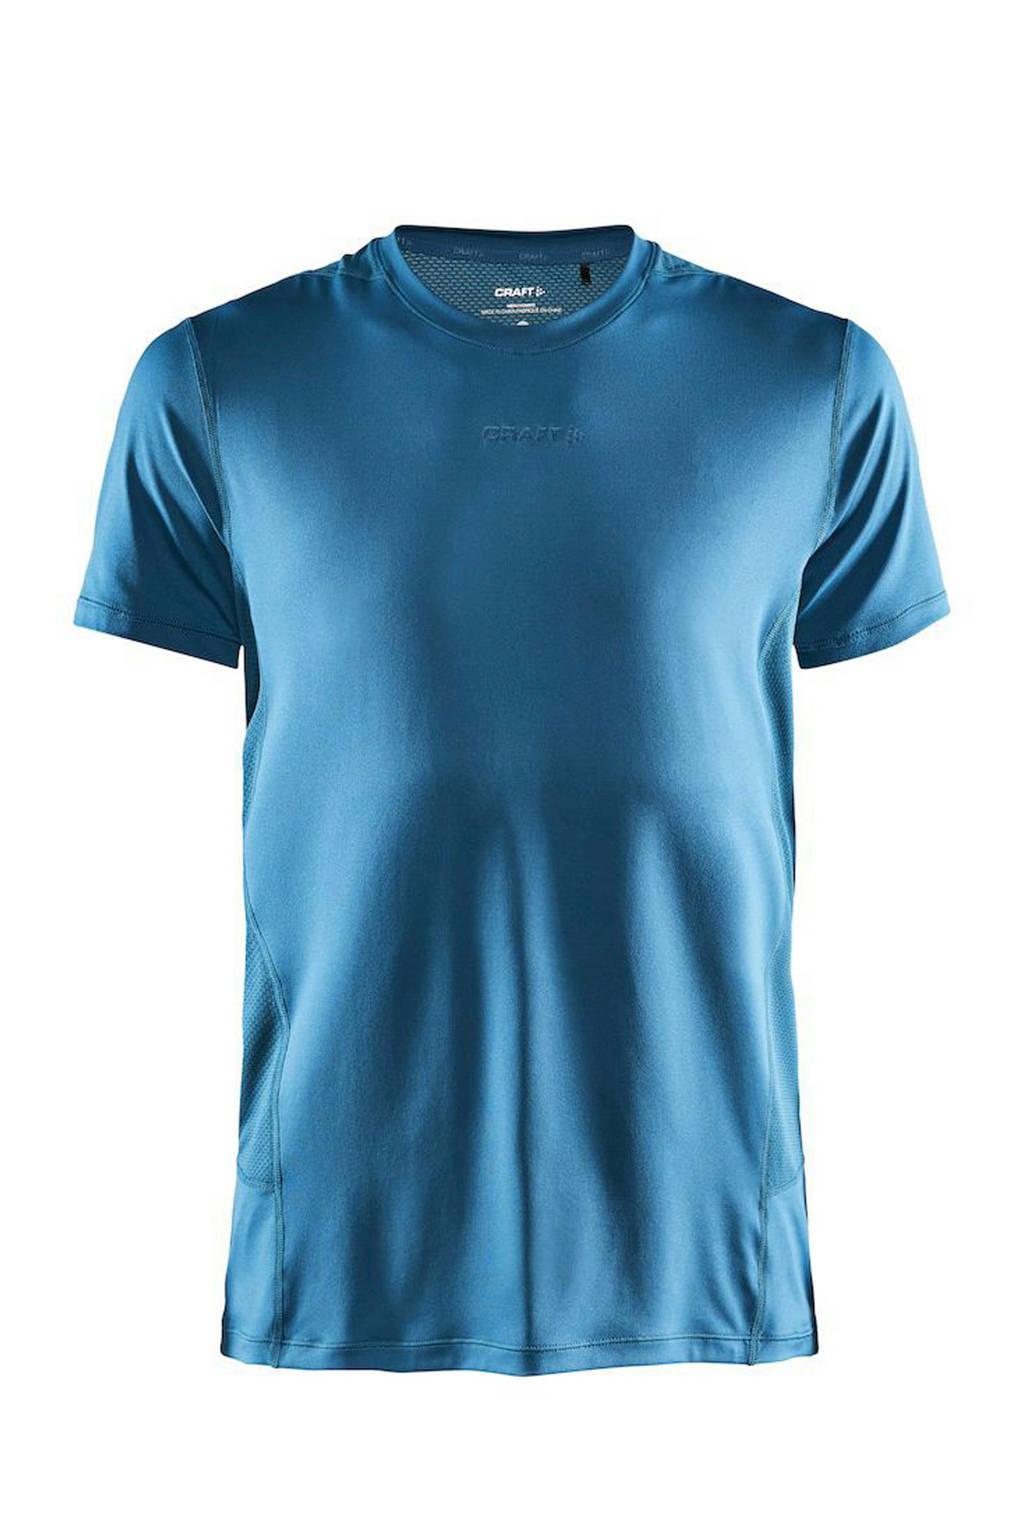 Craft   sport T-shirt blauw, Blauw